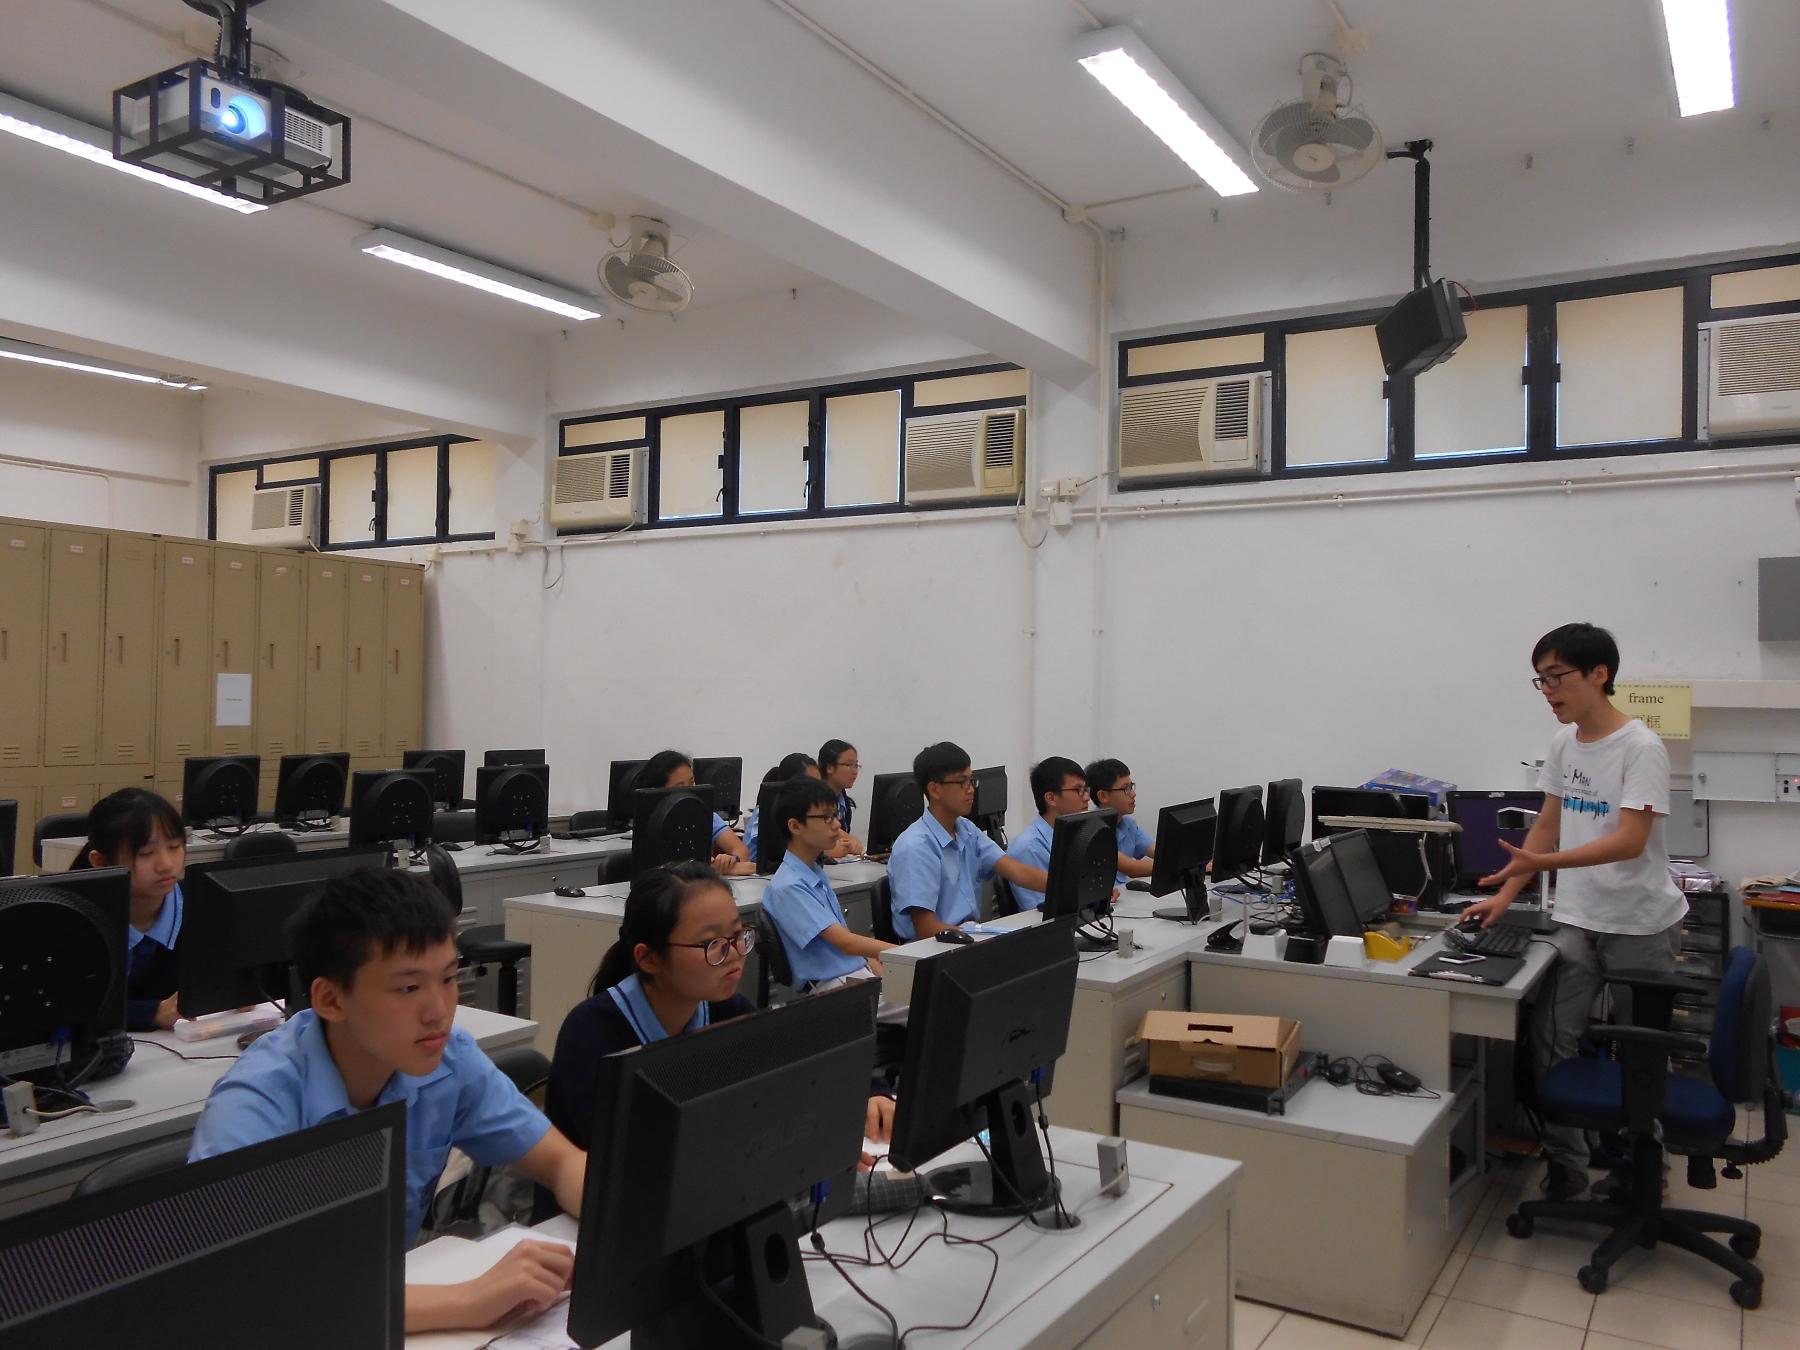 http://www.npc.edu.hk/sites/default/files/dscn0934.jpg